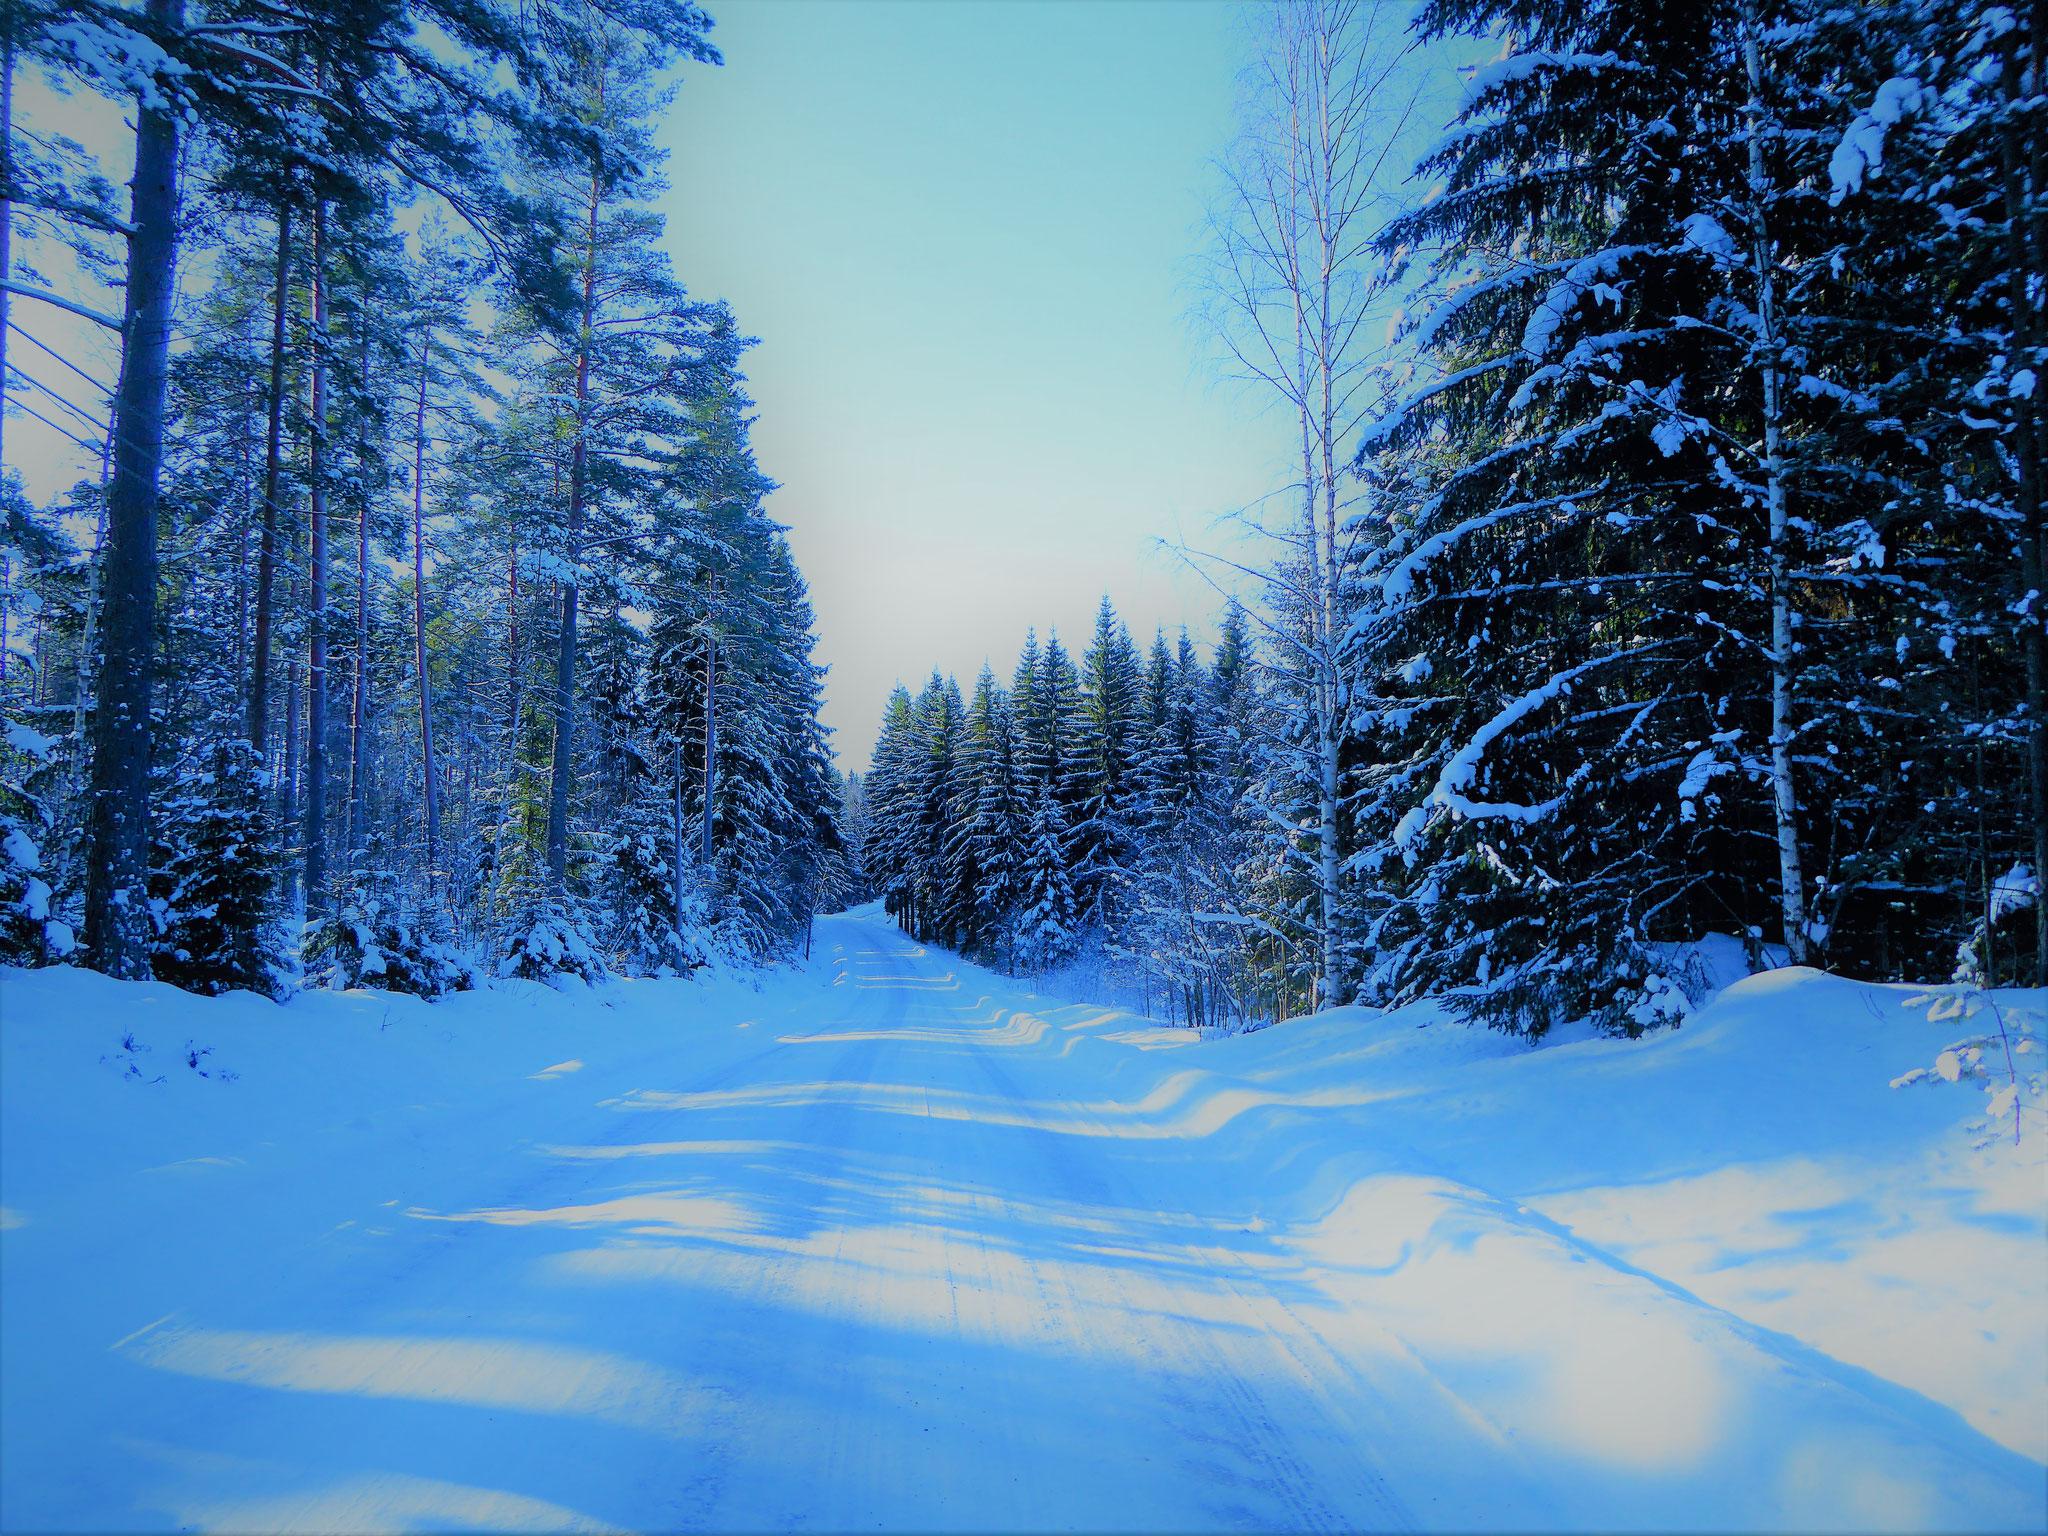 ...  Cross-country skies. Winter bikes ...